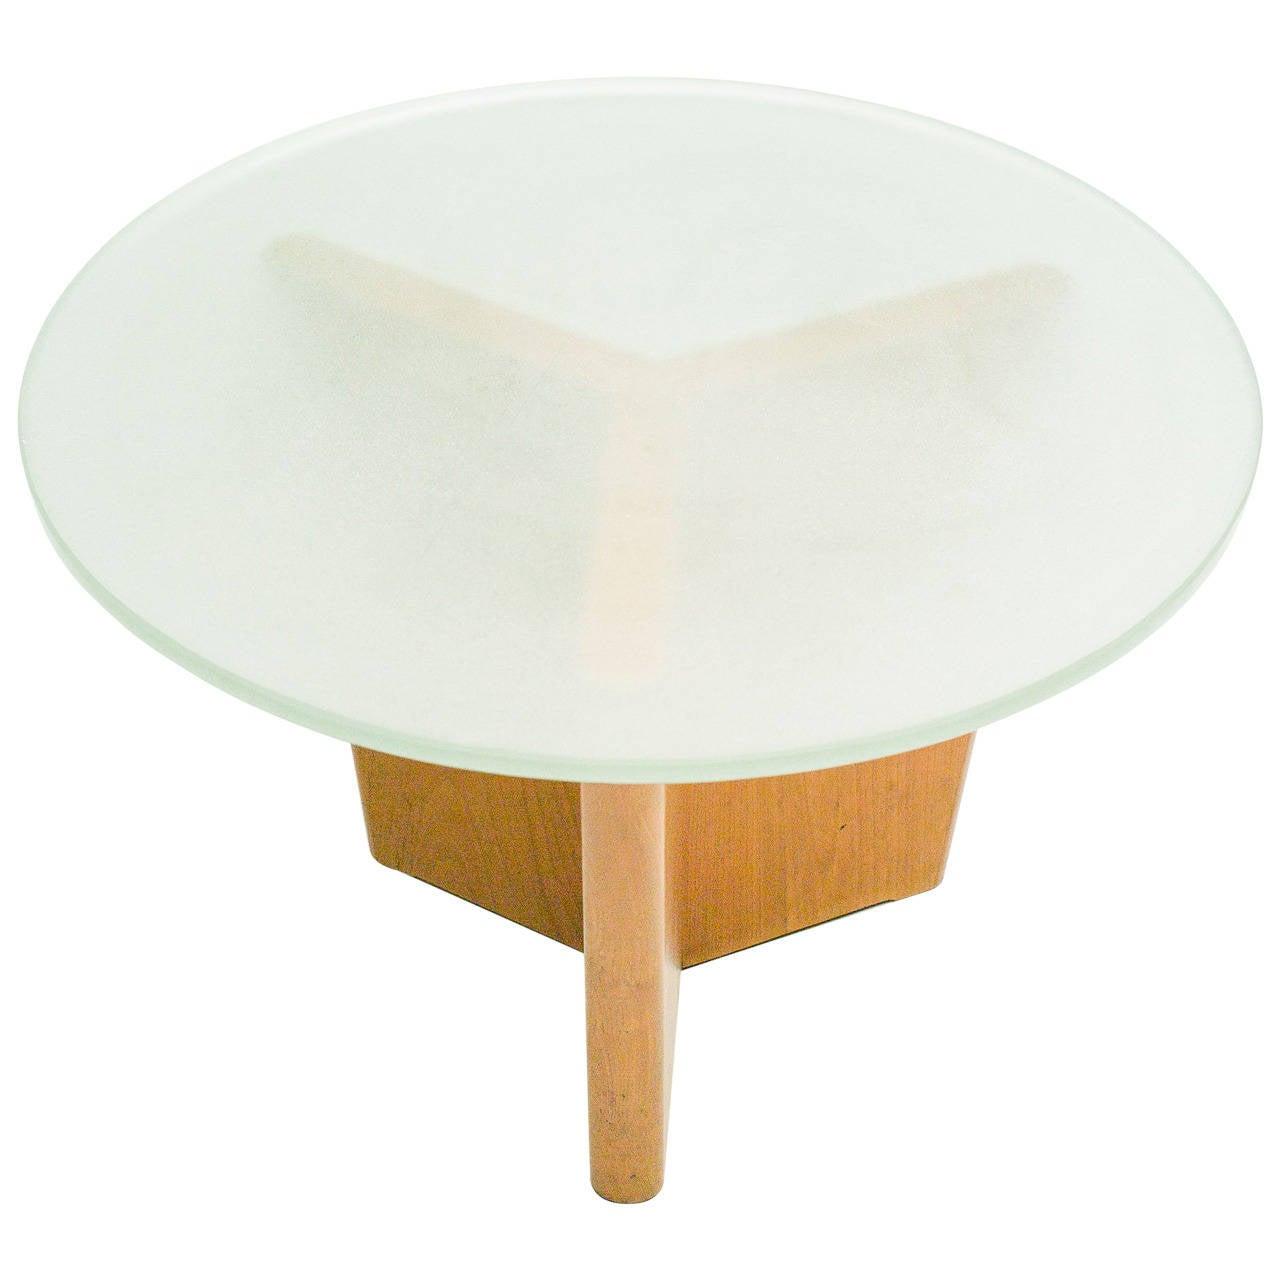 Greta magnusson grossman coffee table at 1stdibs geotapseo Gallery